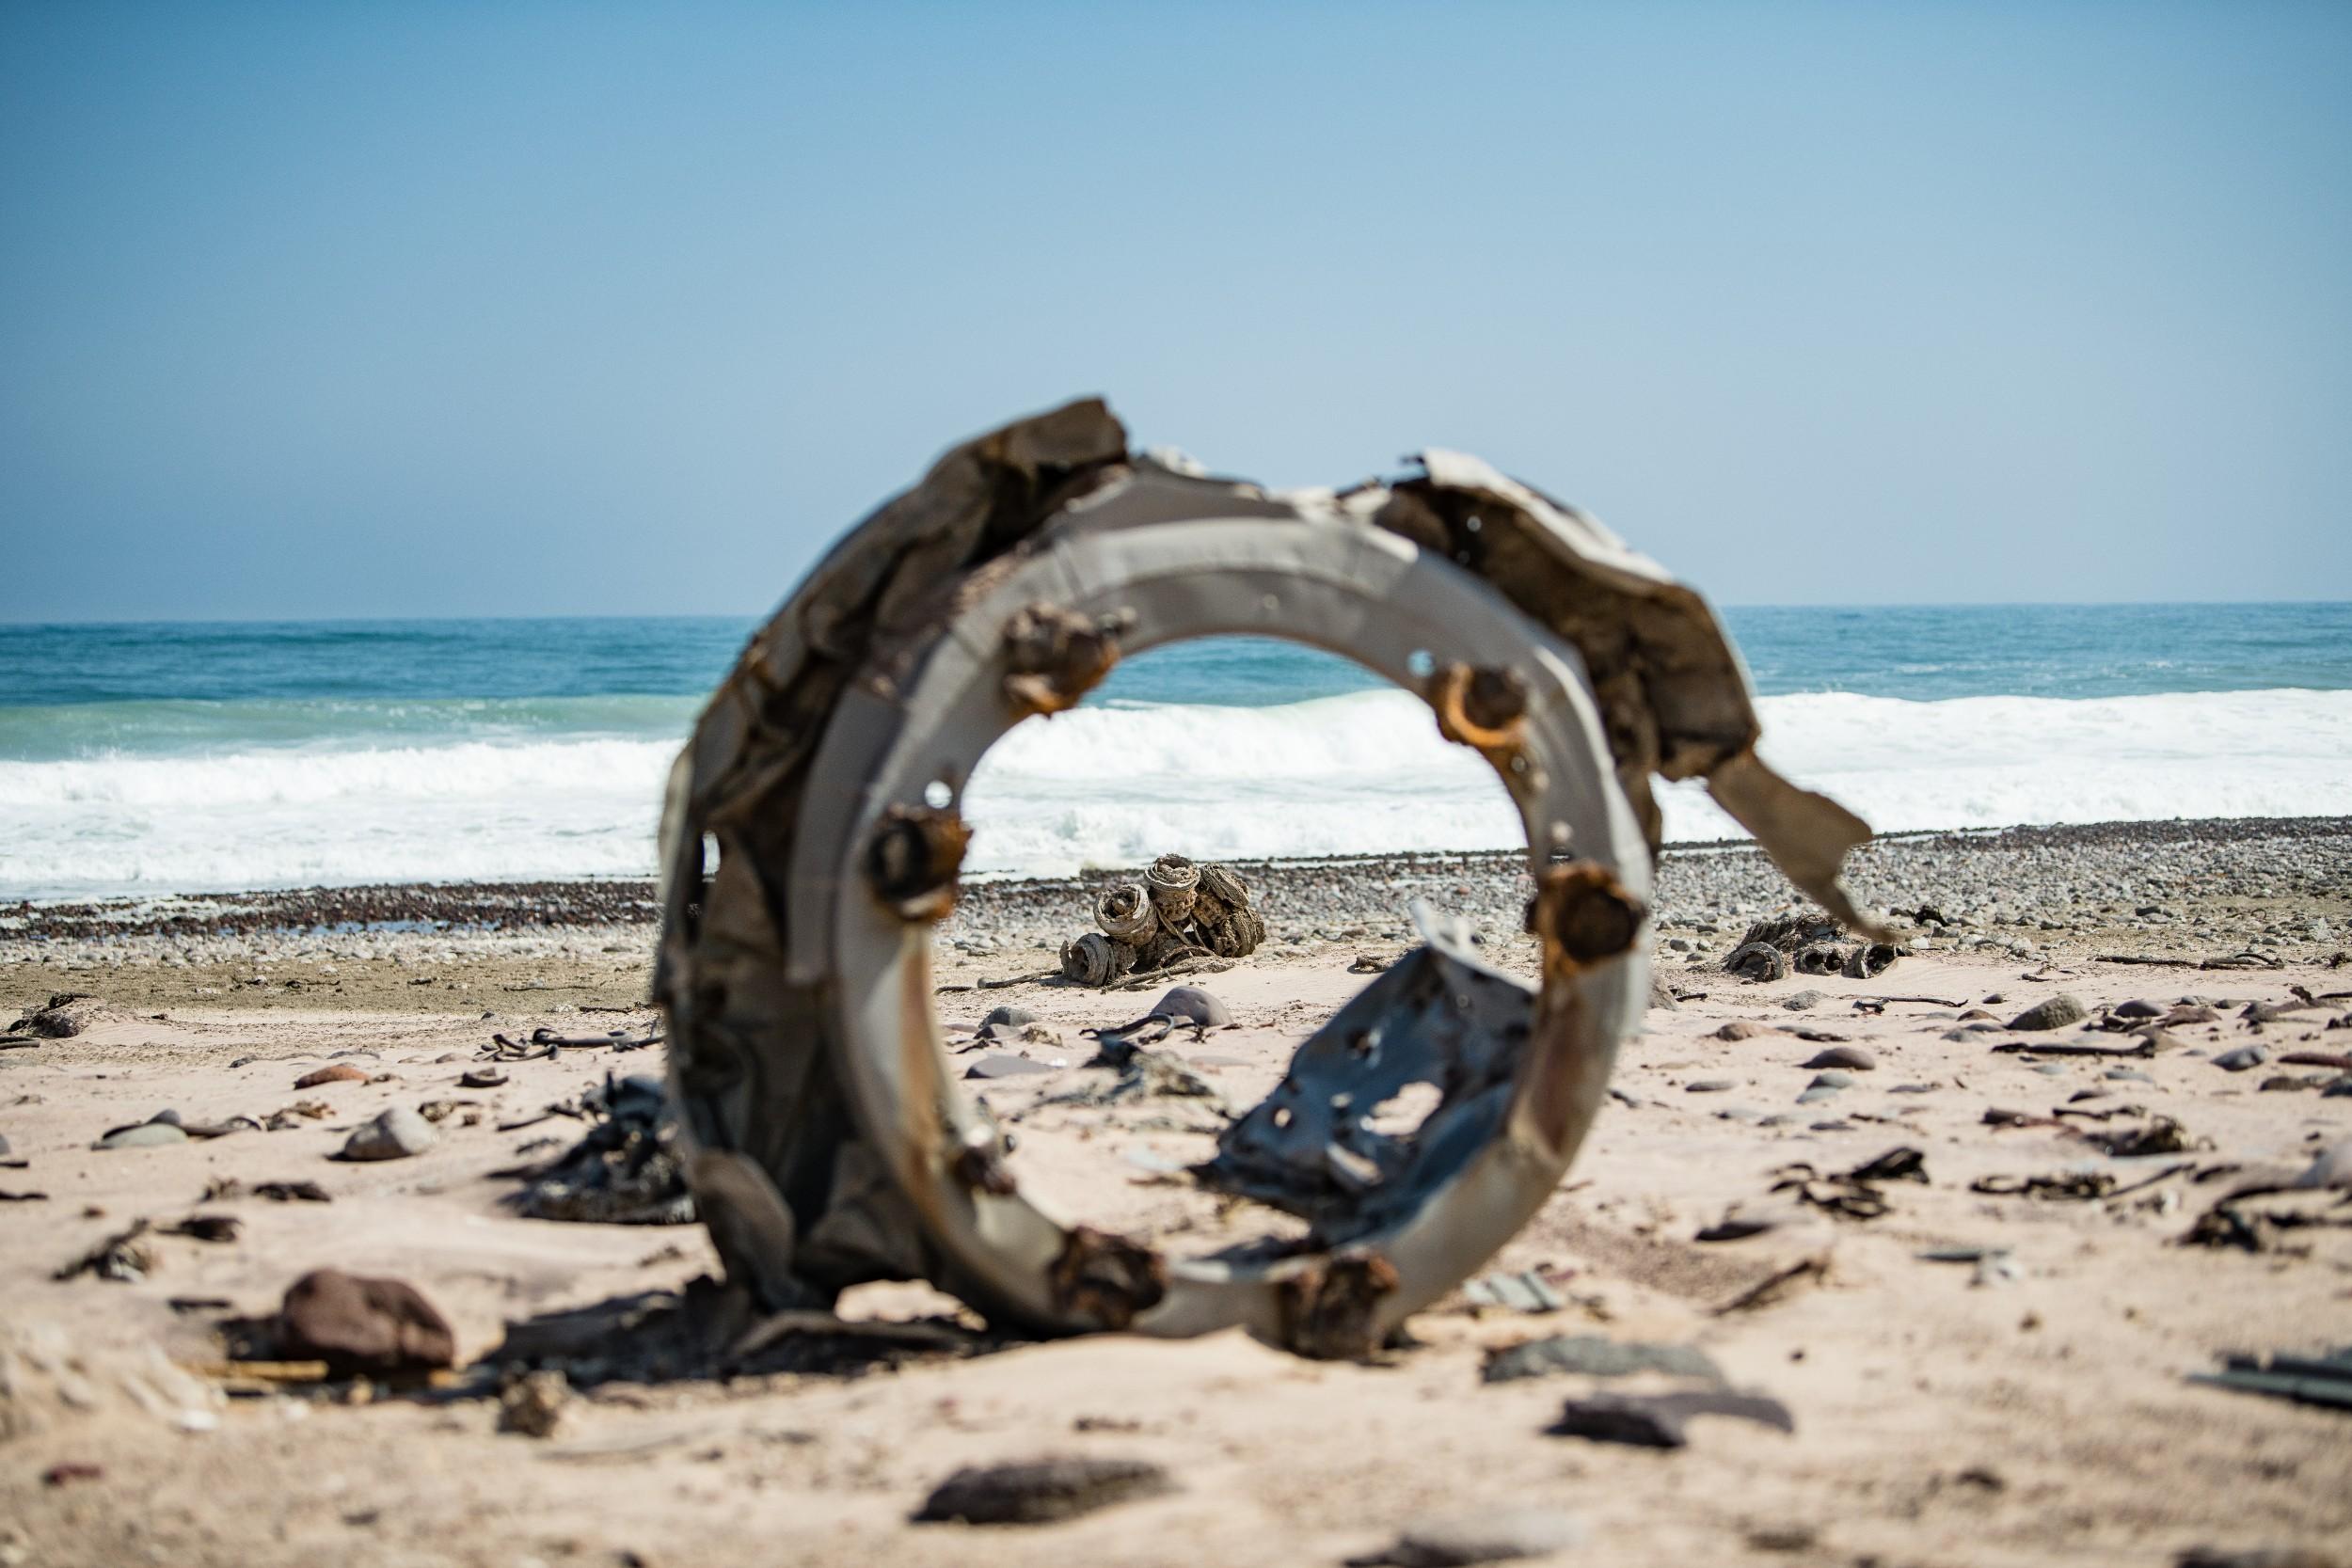 29Shipwreck Lodge - Wrecks along the shore.jpg